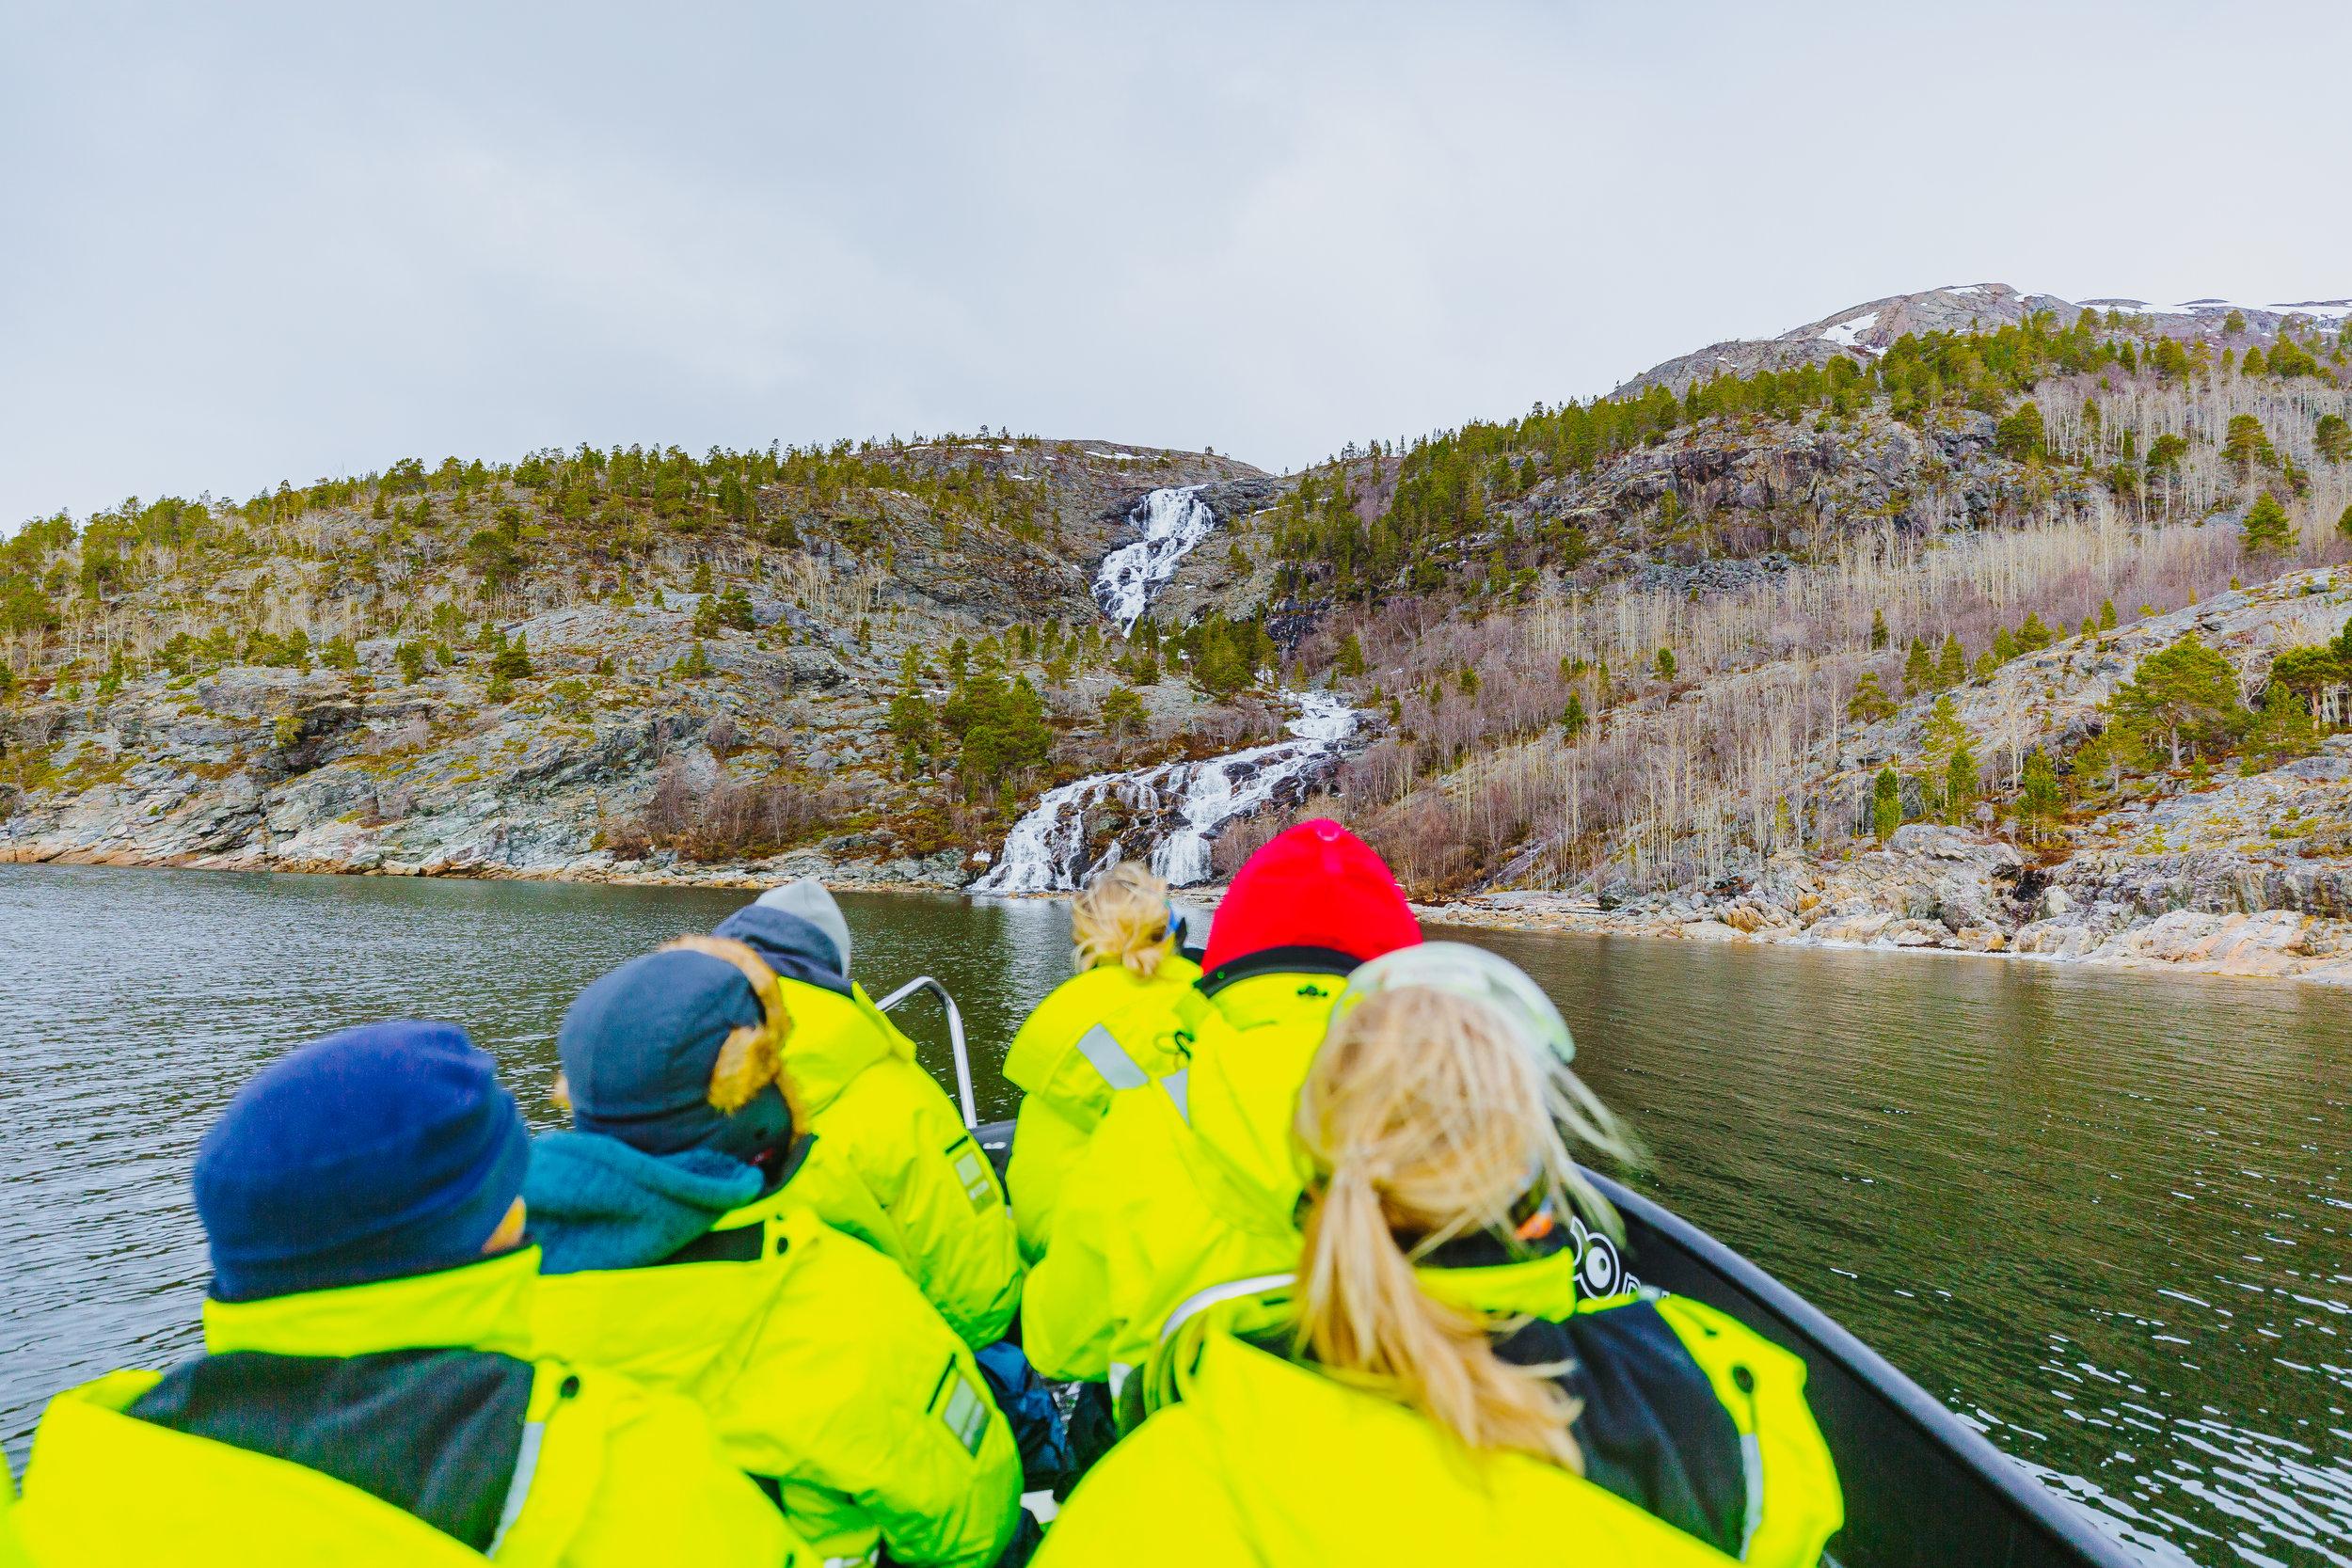 Fjord safari by RIB